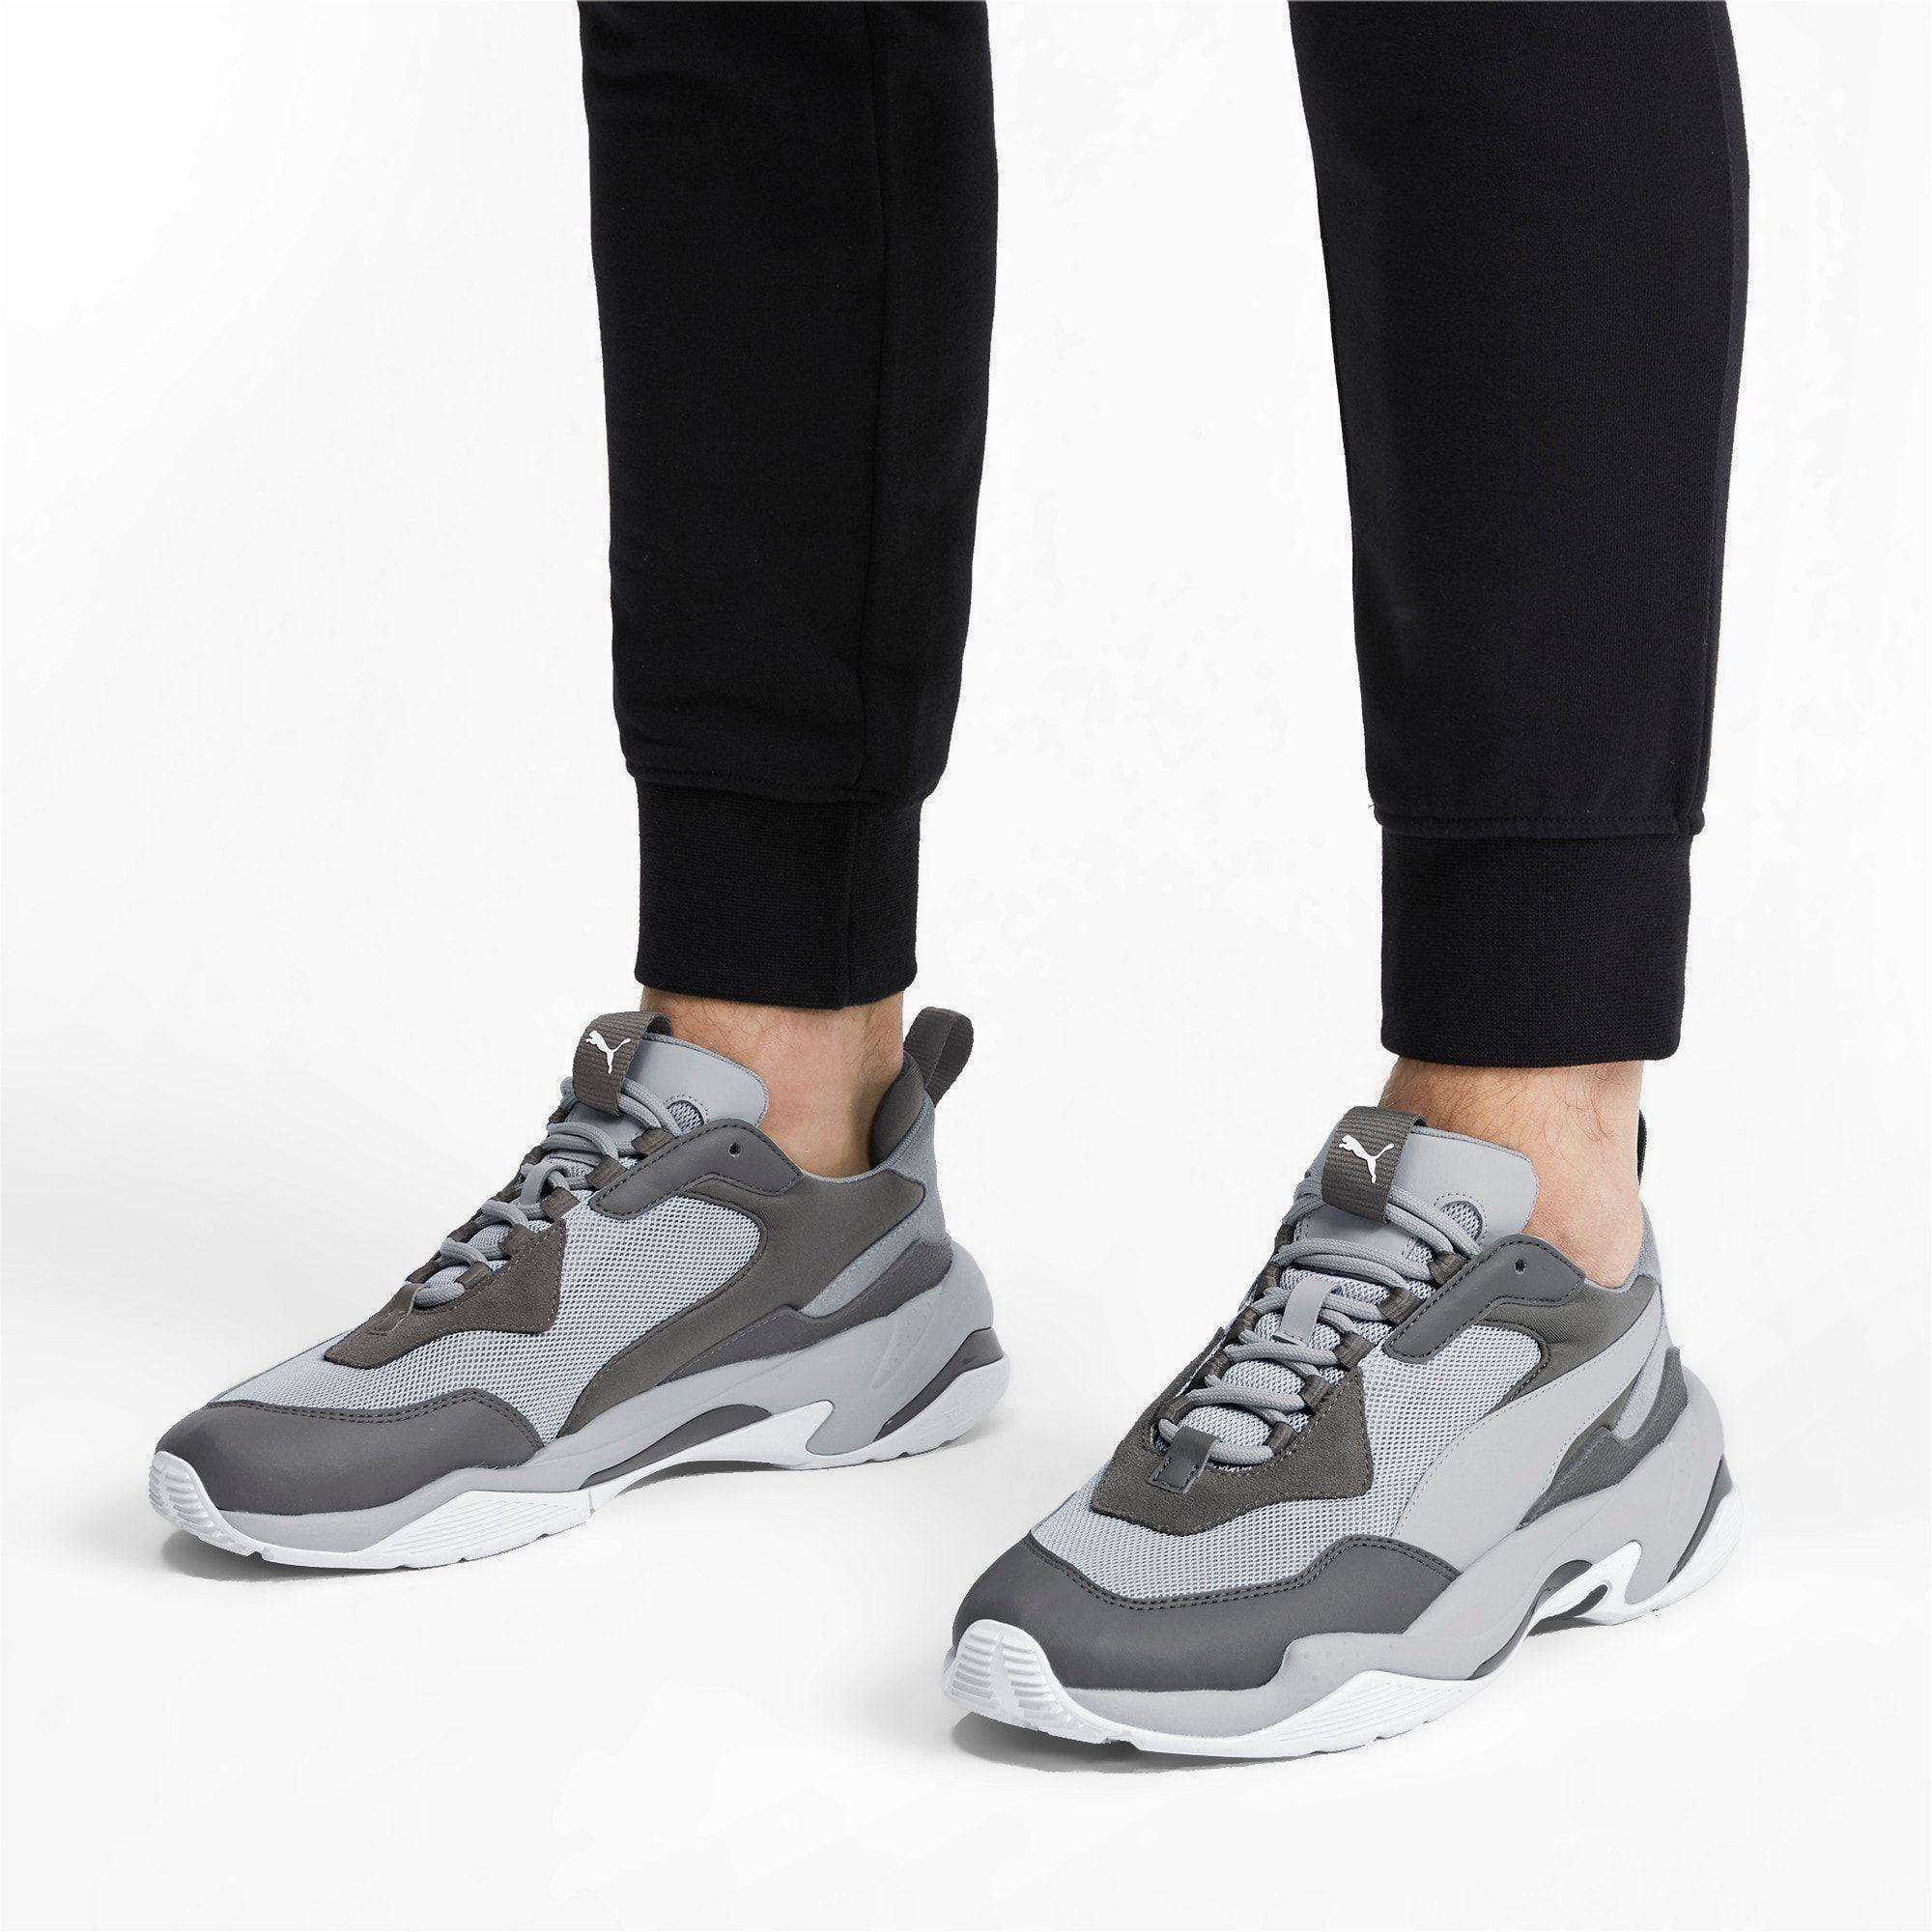 puma thunder fashion 2.0